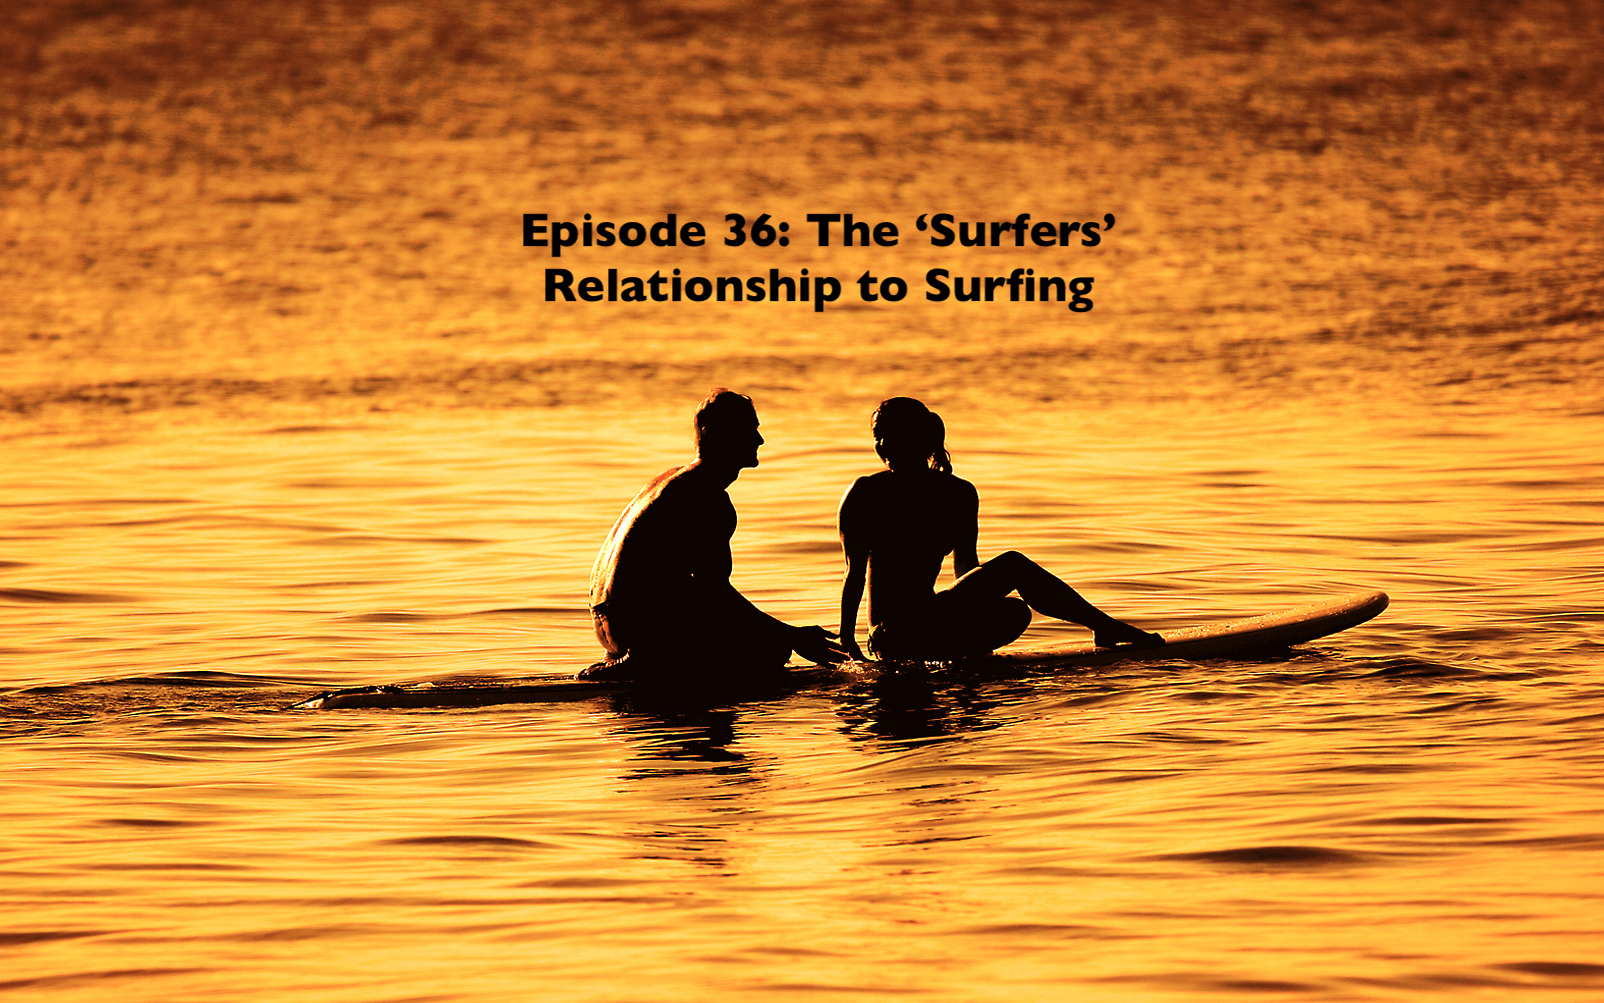 surf-couple-sunset-photo1.jpg